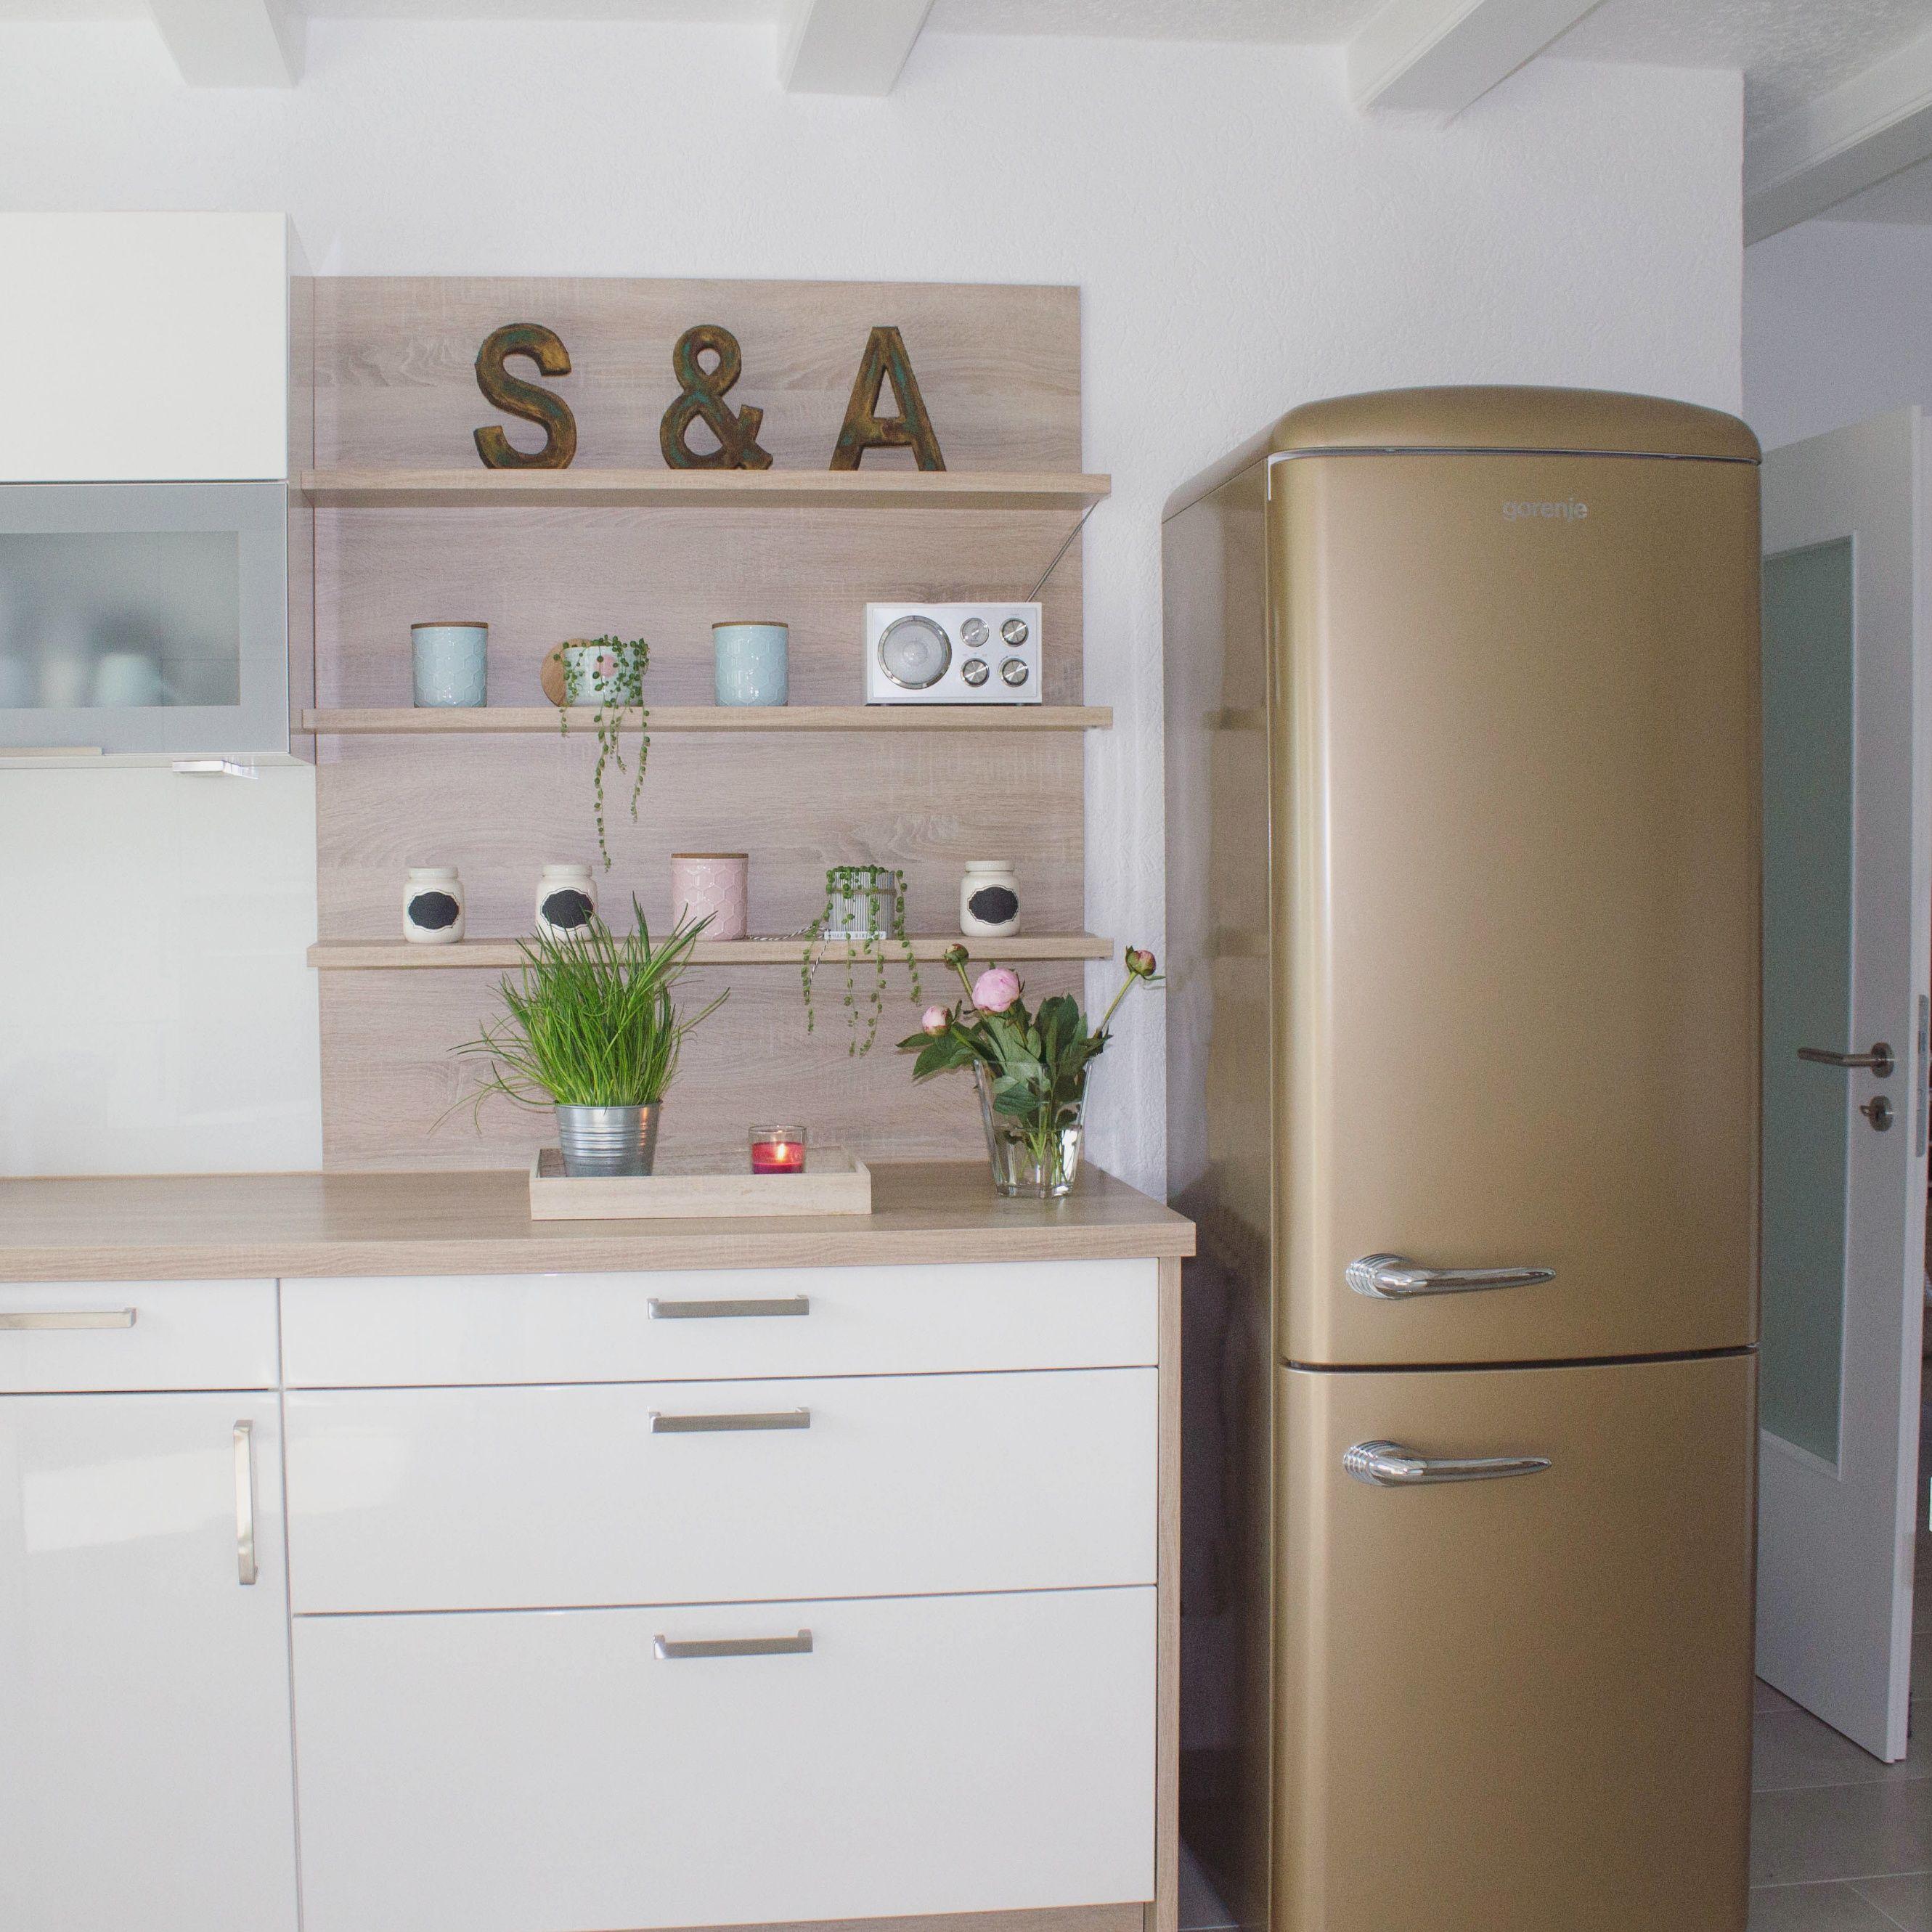 Kuche Kitchen Kitchendetails Kuchendetails Kochen Wohnen Living